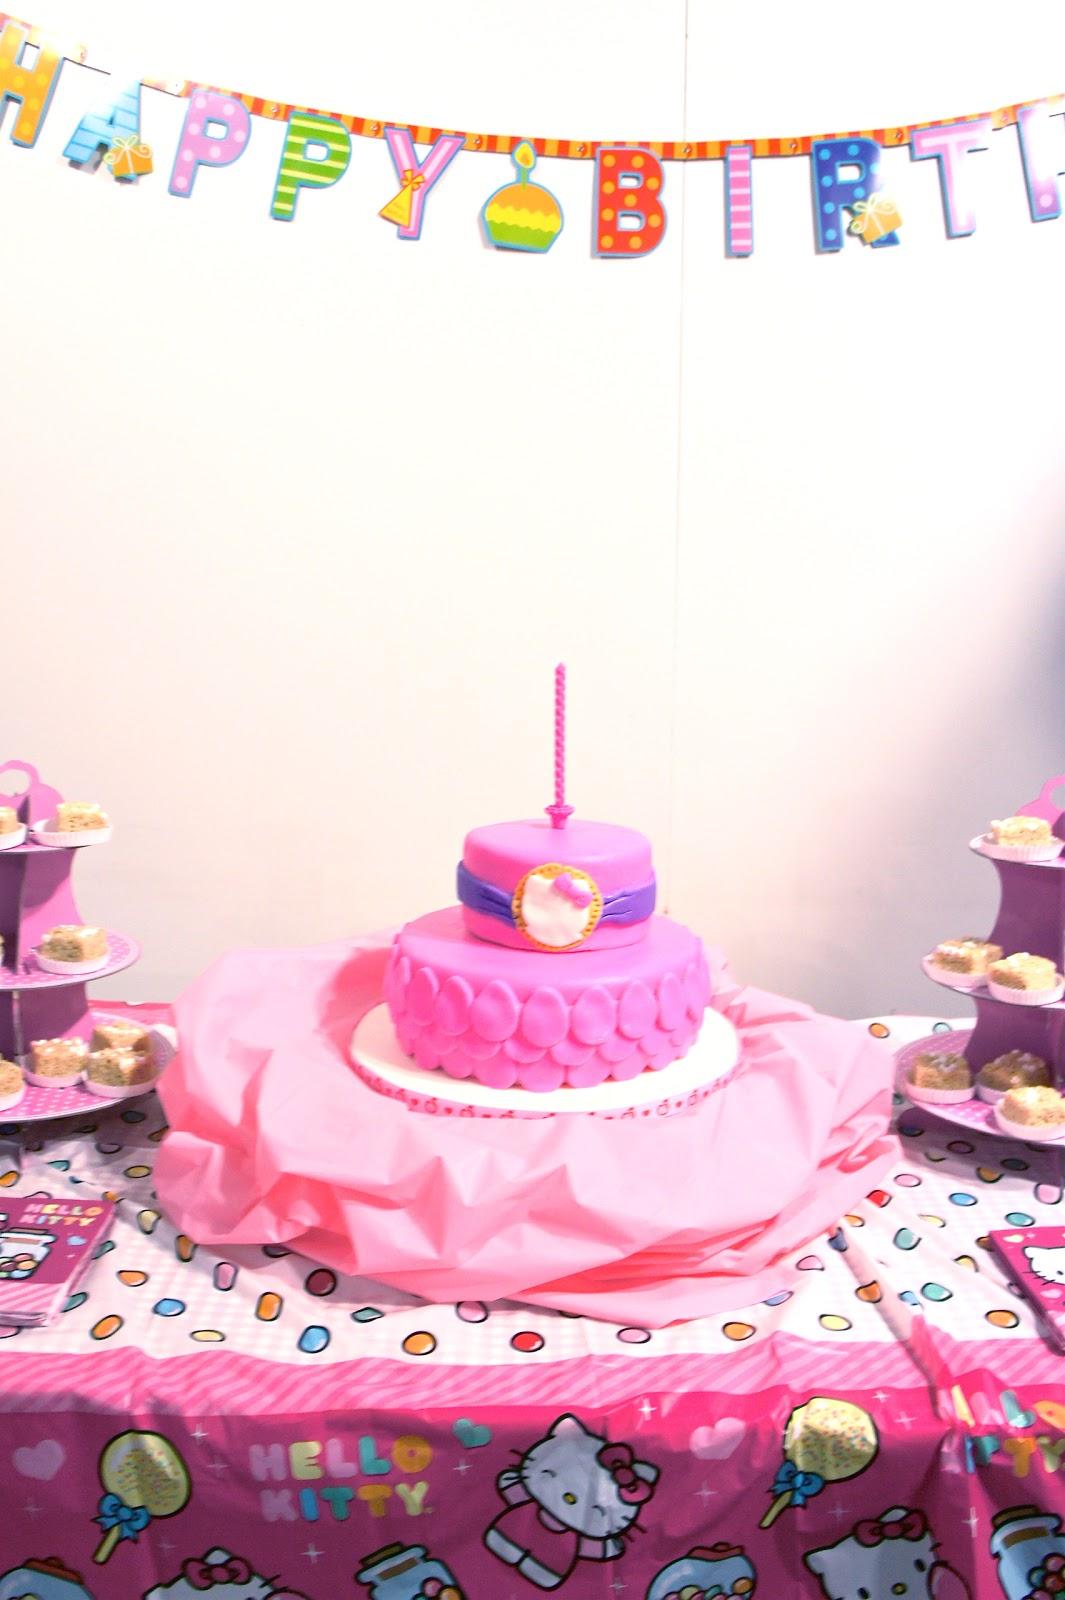 Mum Inspired By: Hello Kitty Theme Birthday Party